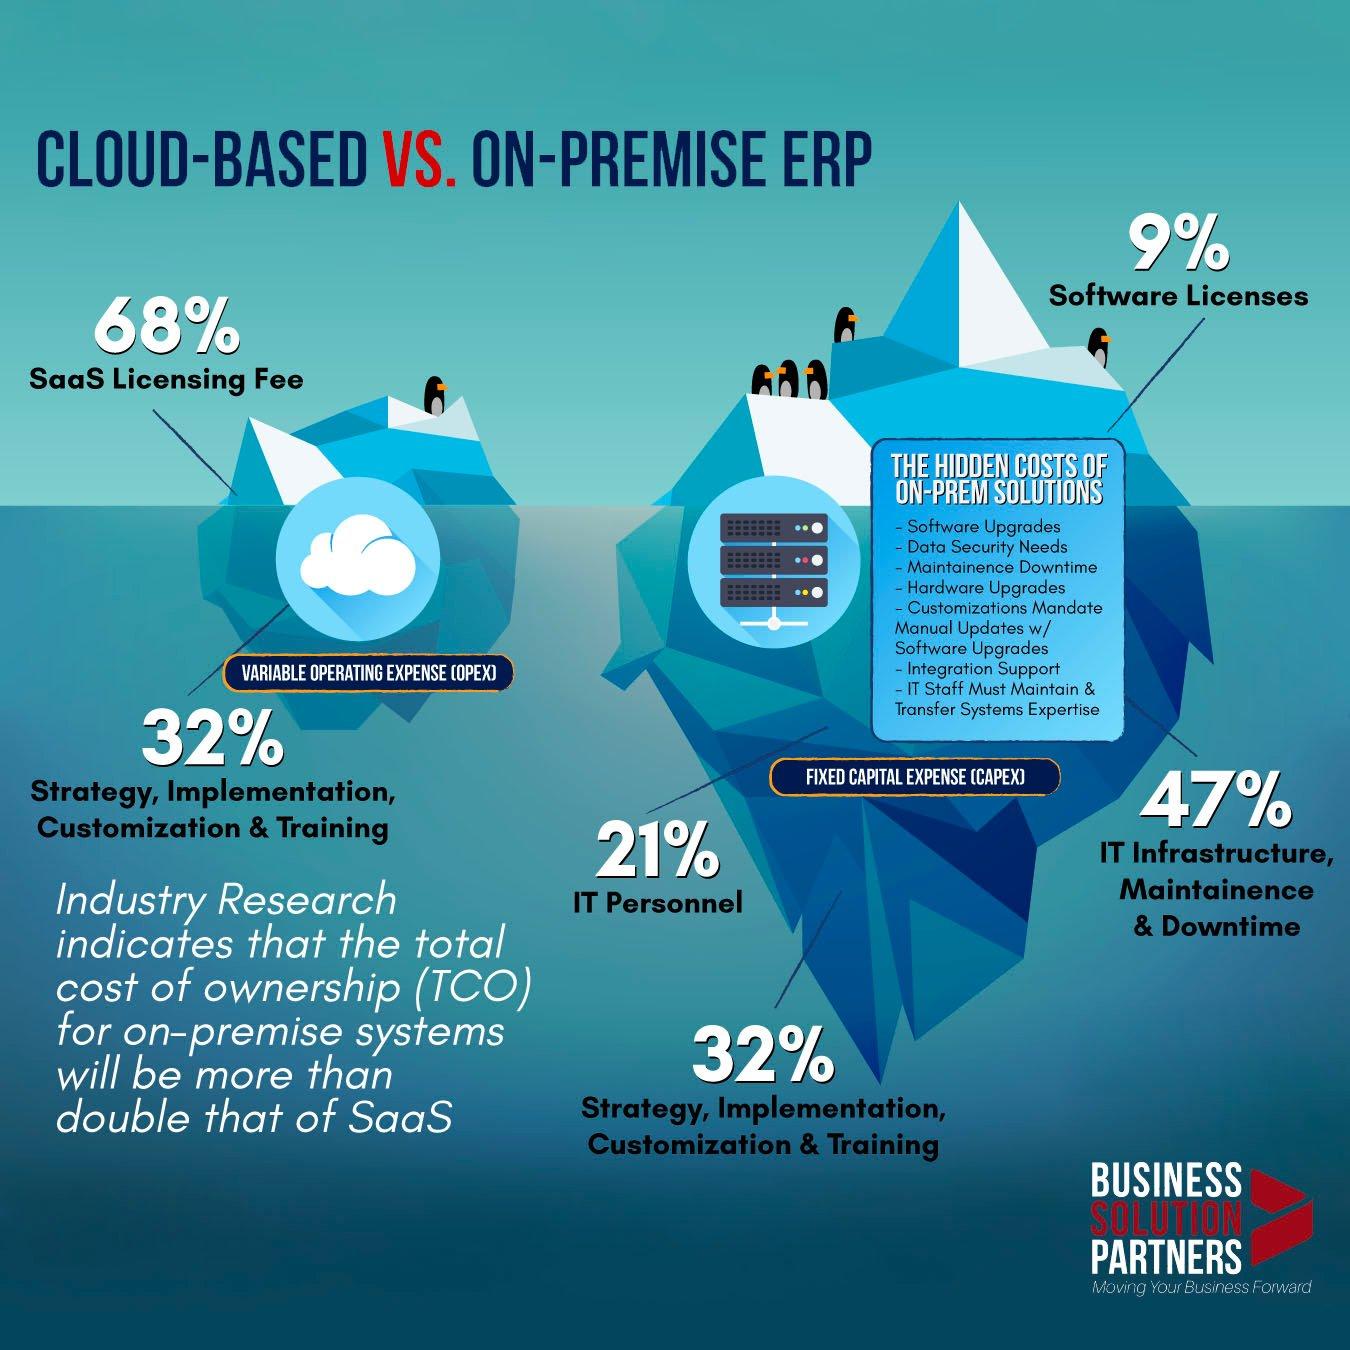 BSP_CloudVPrem2